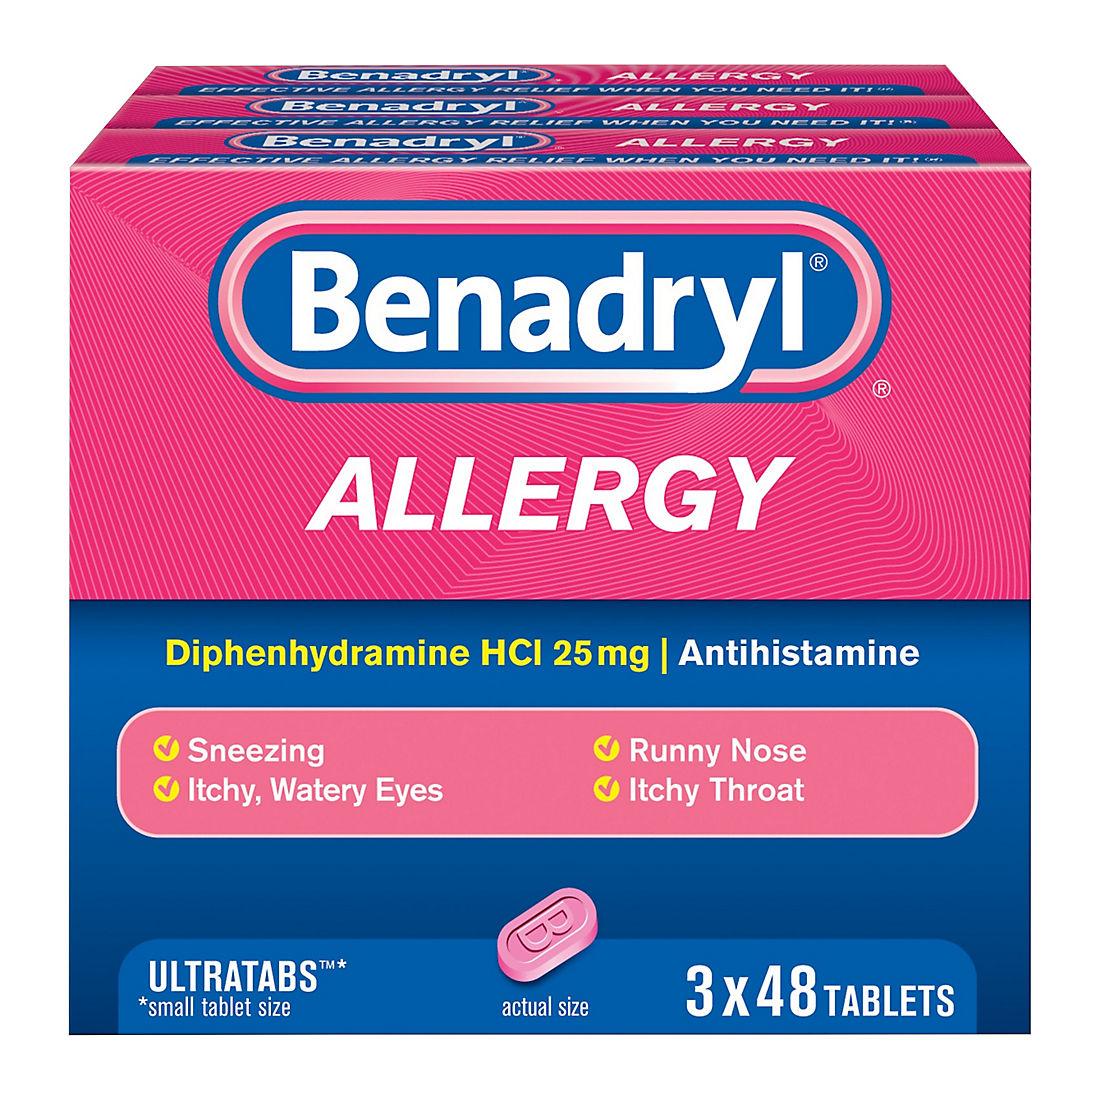 Benadryl Ultratab Antihistamine Allergy Medicine Tablets, 3 pk /48 ct